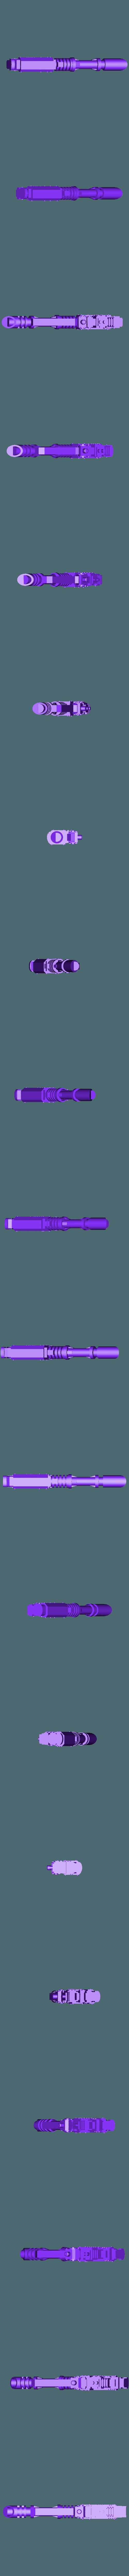 HWT_Lascannon.stl Download free STL file Lascannon (Heavy weapon team) • Model to 3D print, Solutionlesn